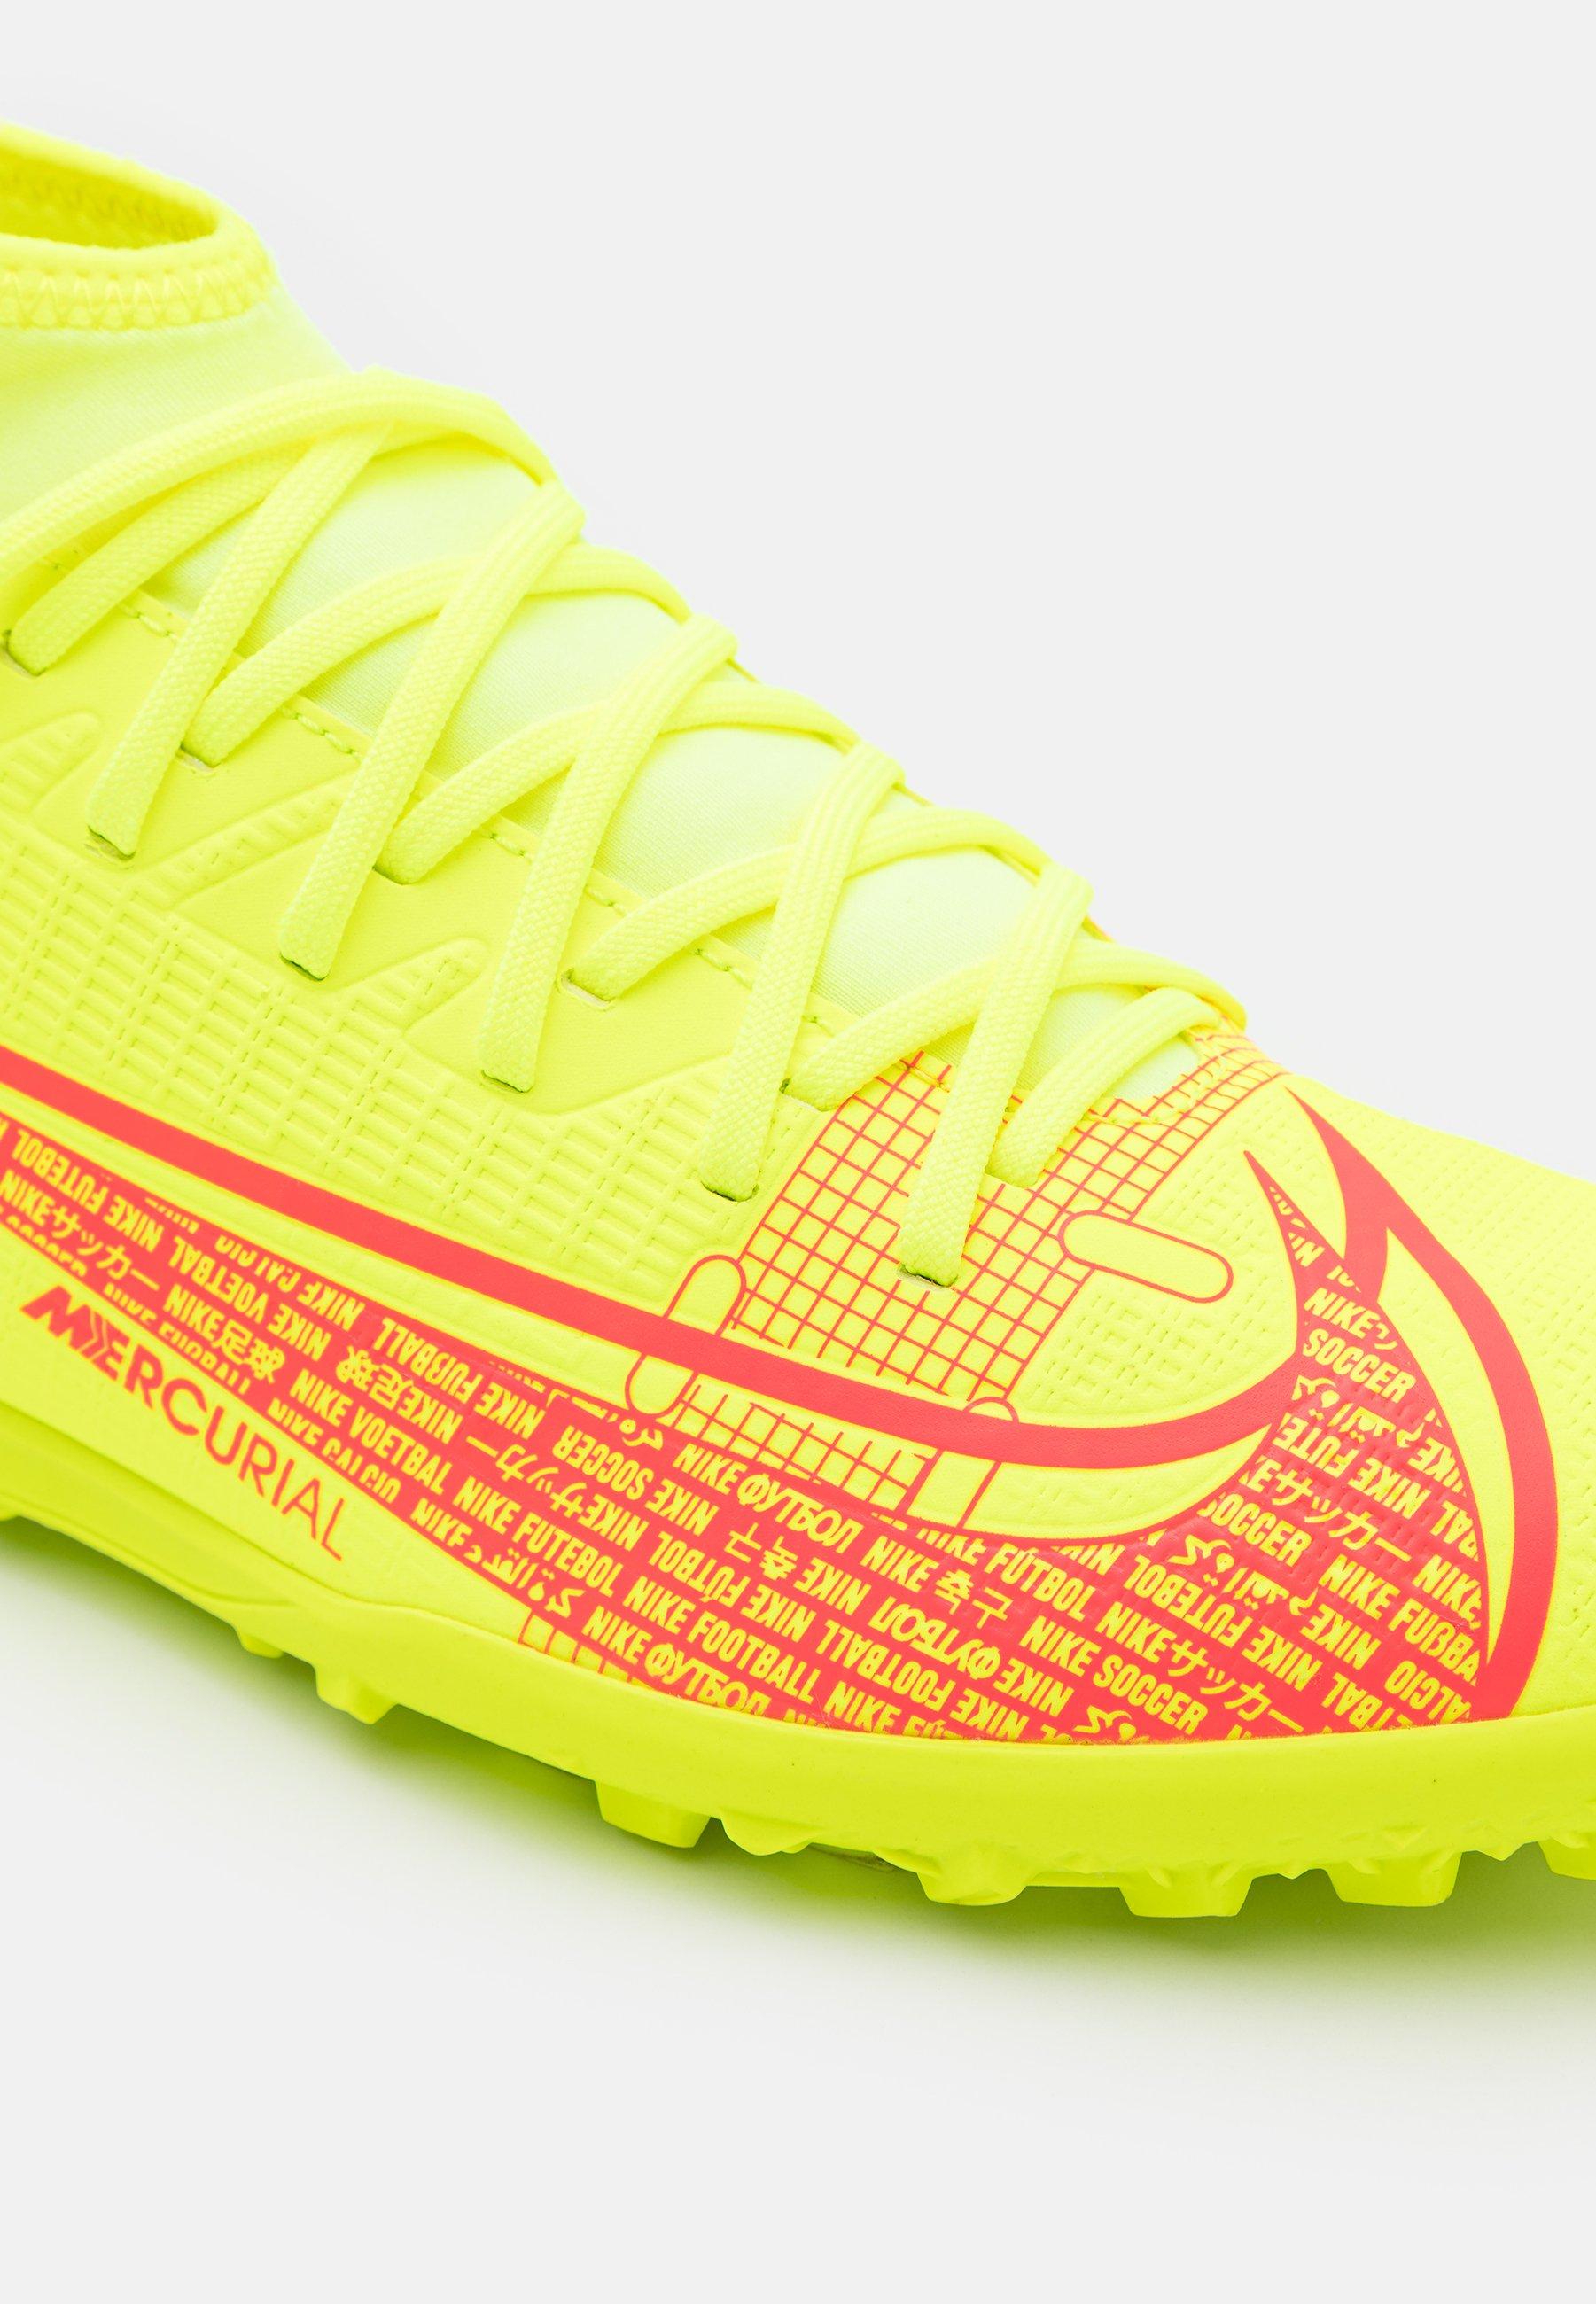 Herrer MERCURIAL 8 CLUB TF - Fodboldstøvler m/ multi knobber